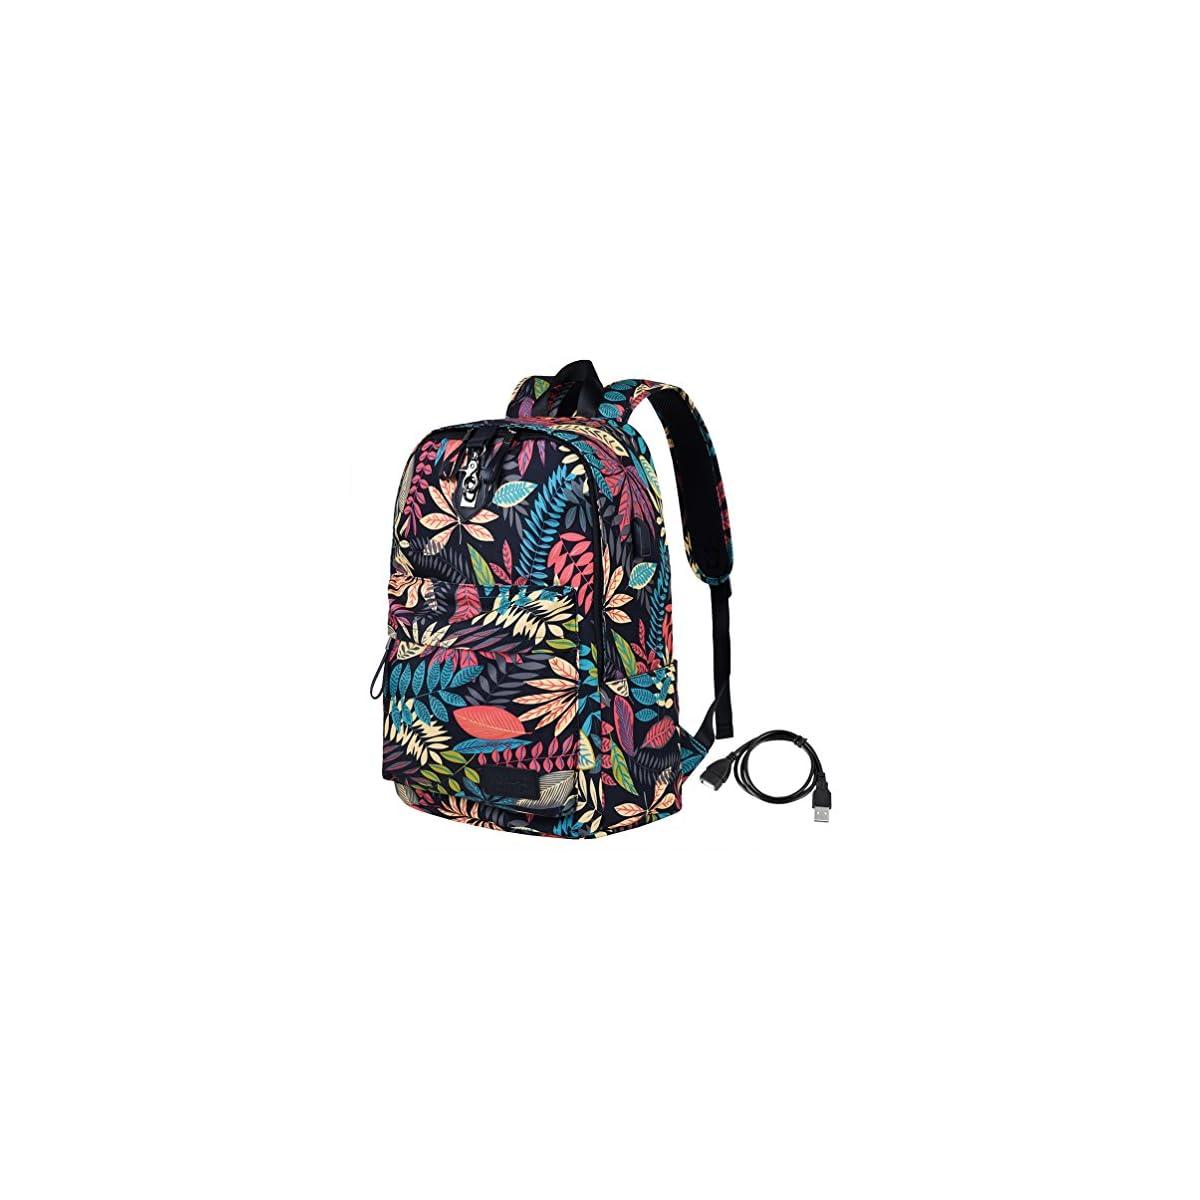 61OTBuE7aiL. SS1200  - Vbiger Bolso portátil antirrobo para niñas Bolso Escolar Elegante para portátil de 14 ''